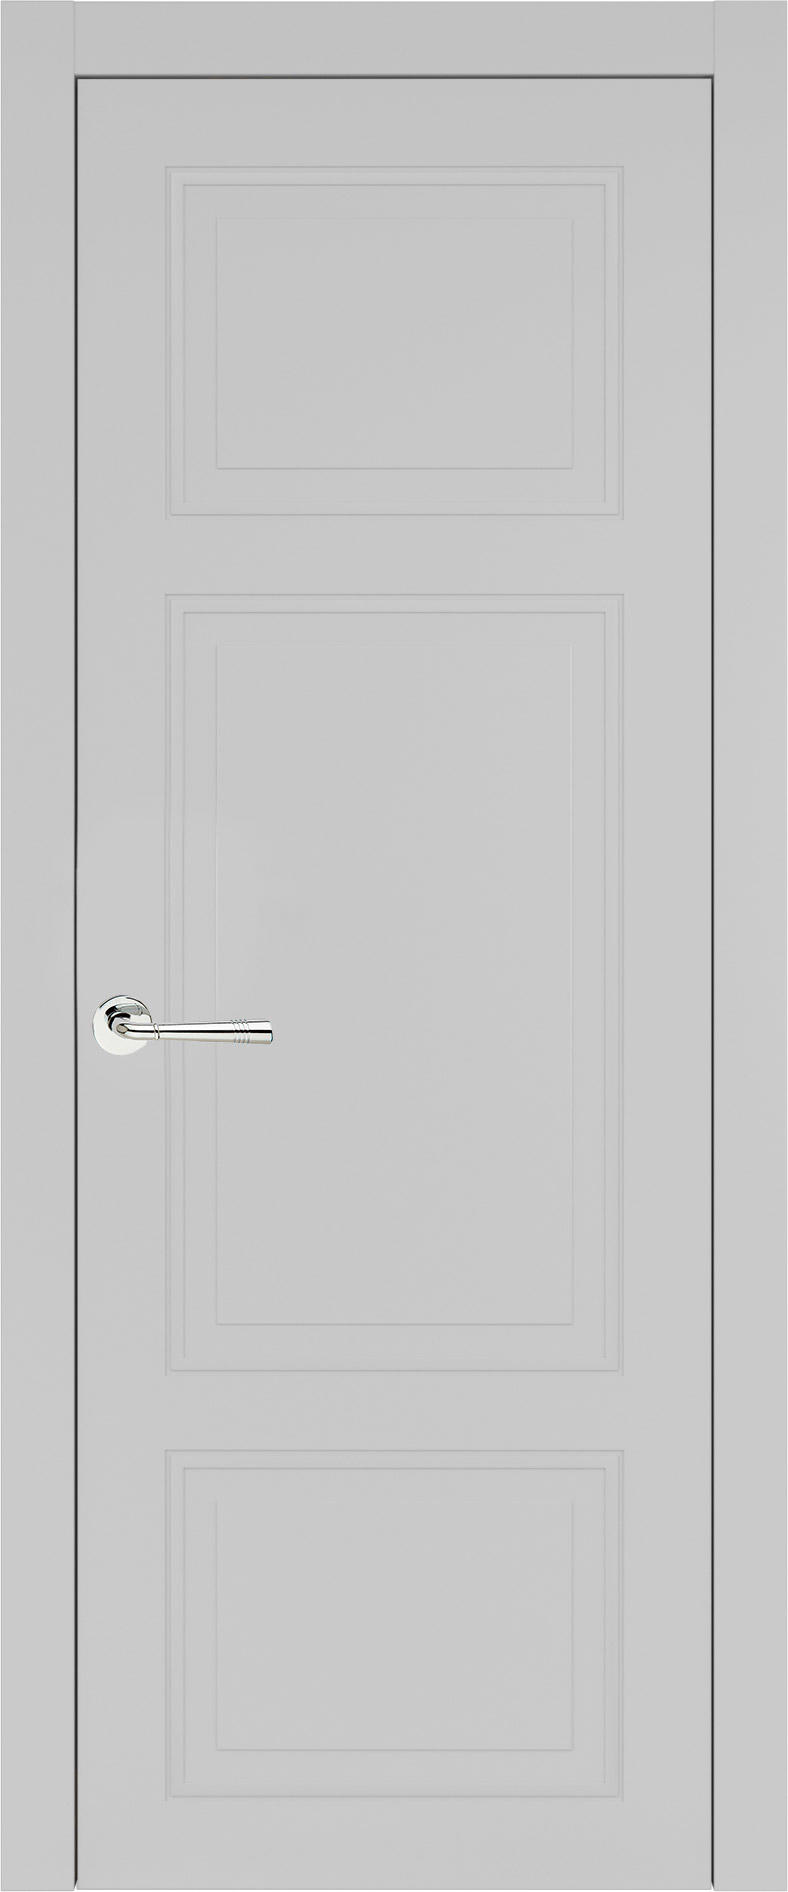 Siena Neo Classic цвет - Серая эмаль (RAL 7047) Без стекла (ДГ)